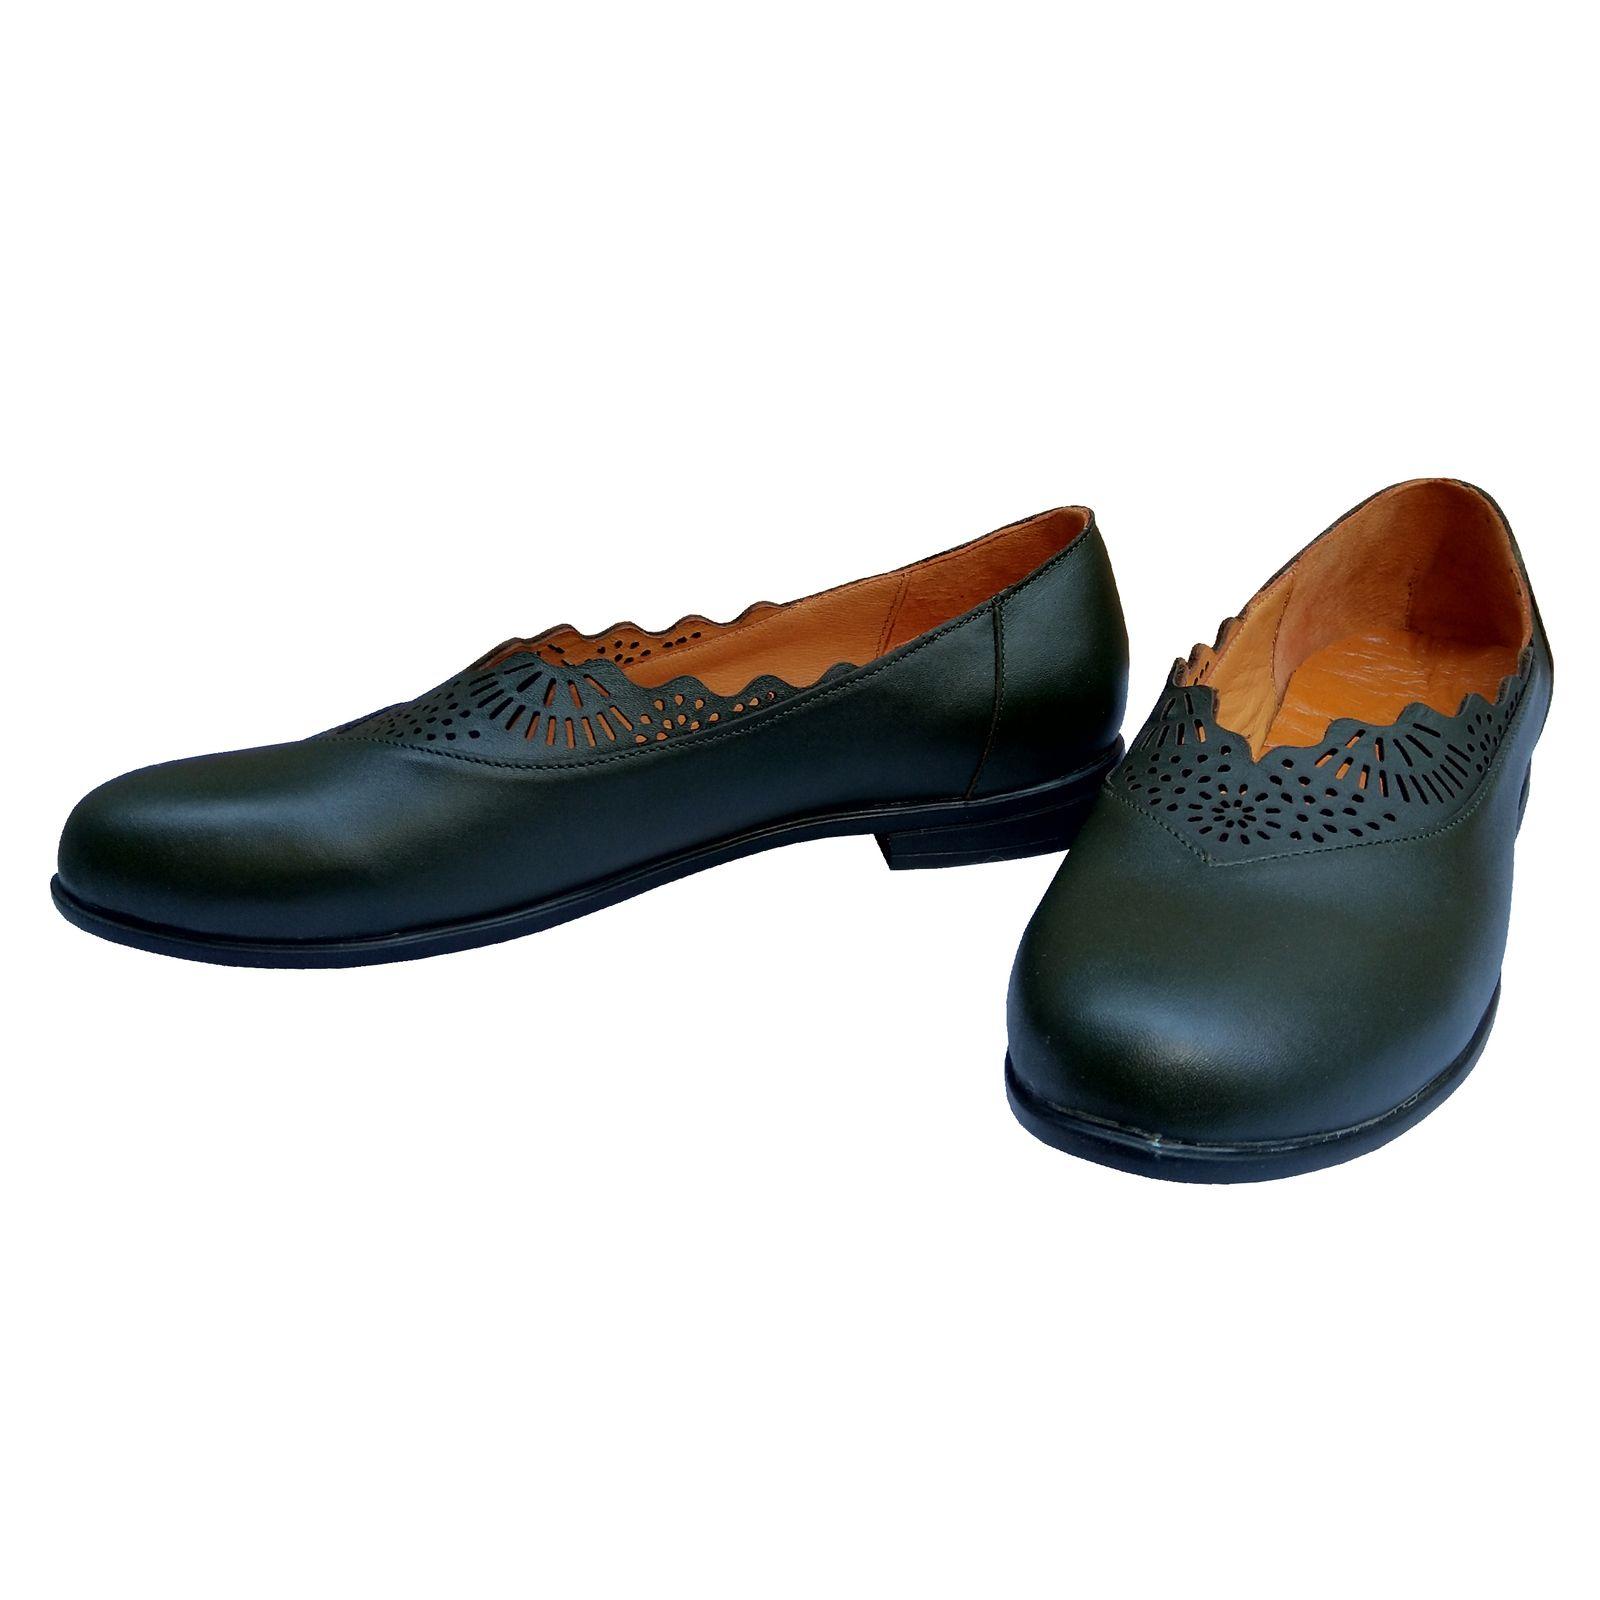 کفش زنانه مدل SK 308 -  - 4